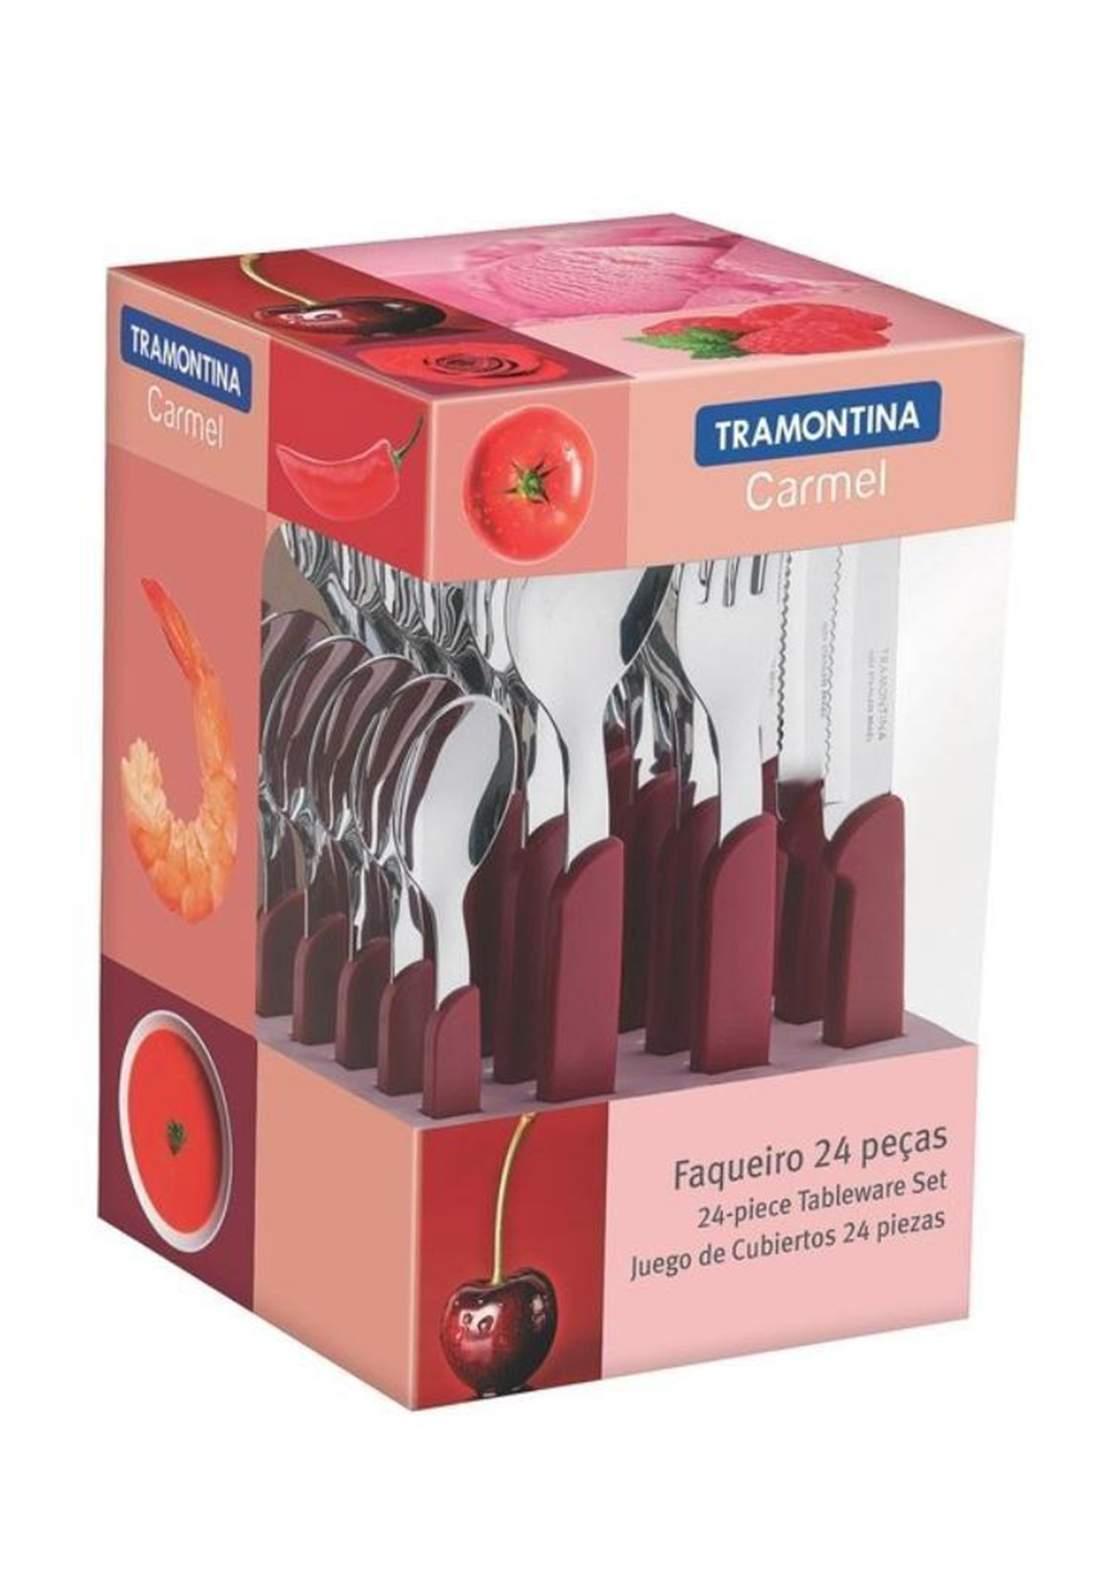 Tramontina '23499-027 Multiply 24 Piece Cutlery Set Red طقم ادوات المطبخ